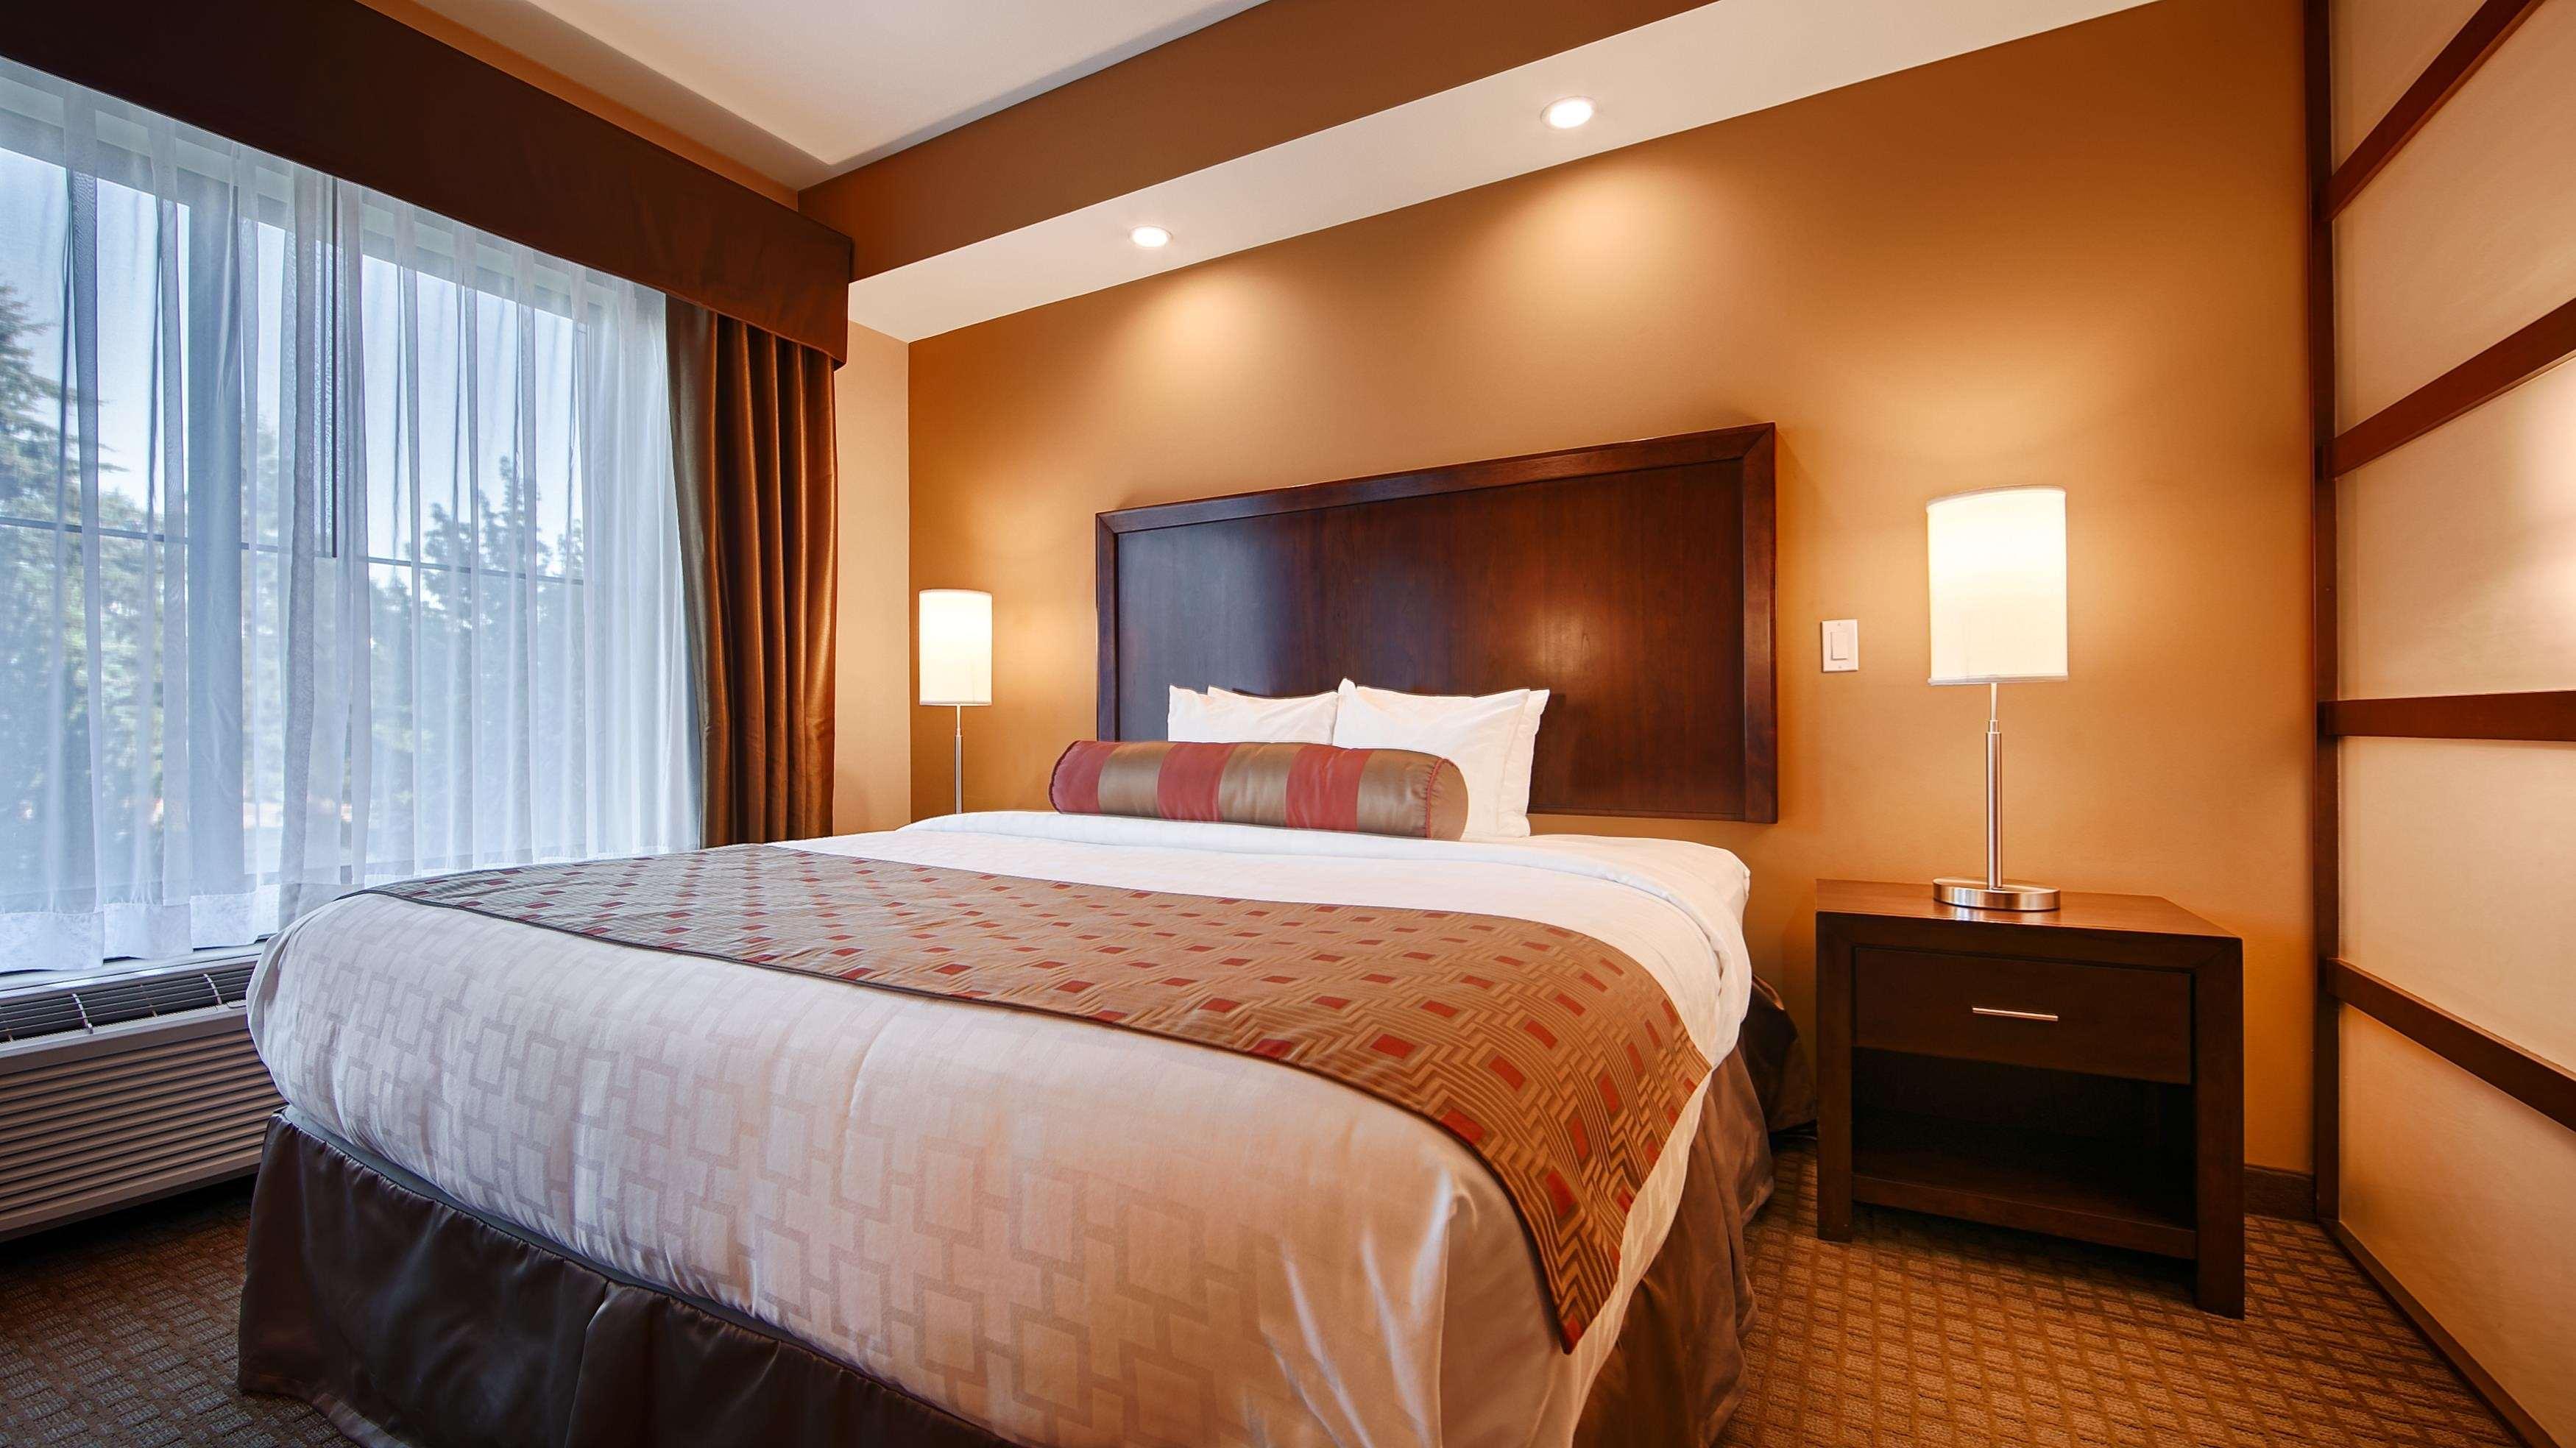 Best Western Plus Lacey Inn & Suites image 18